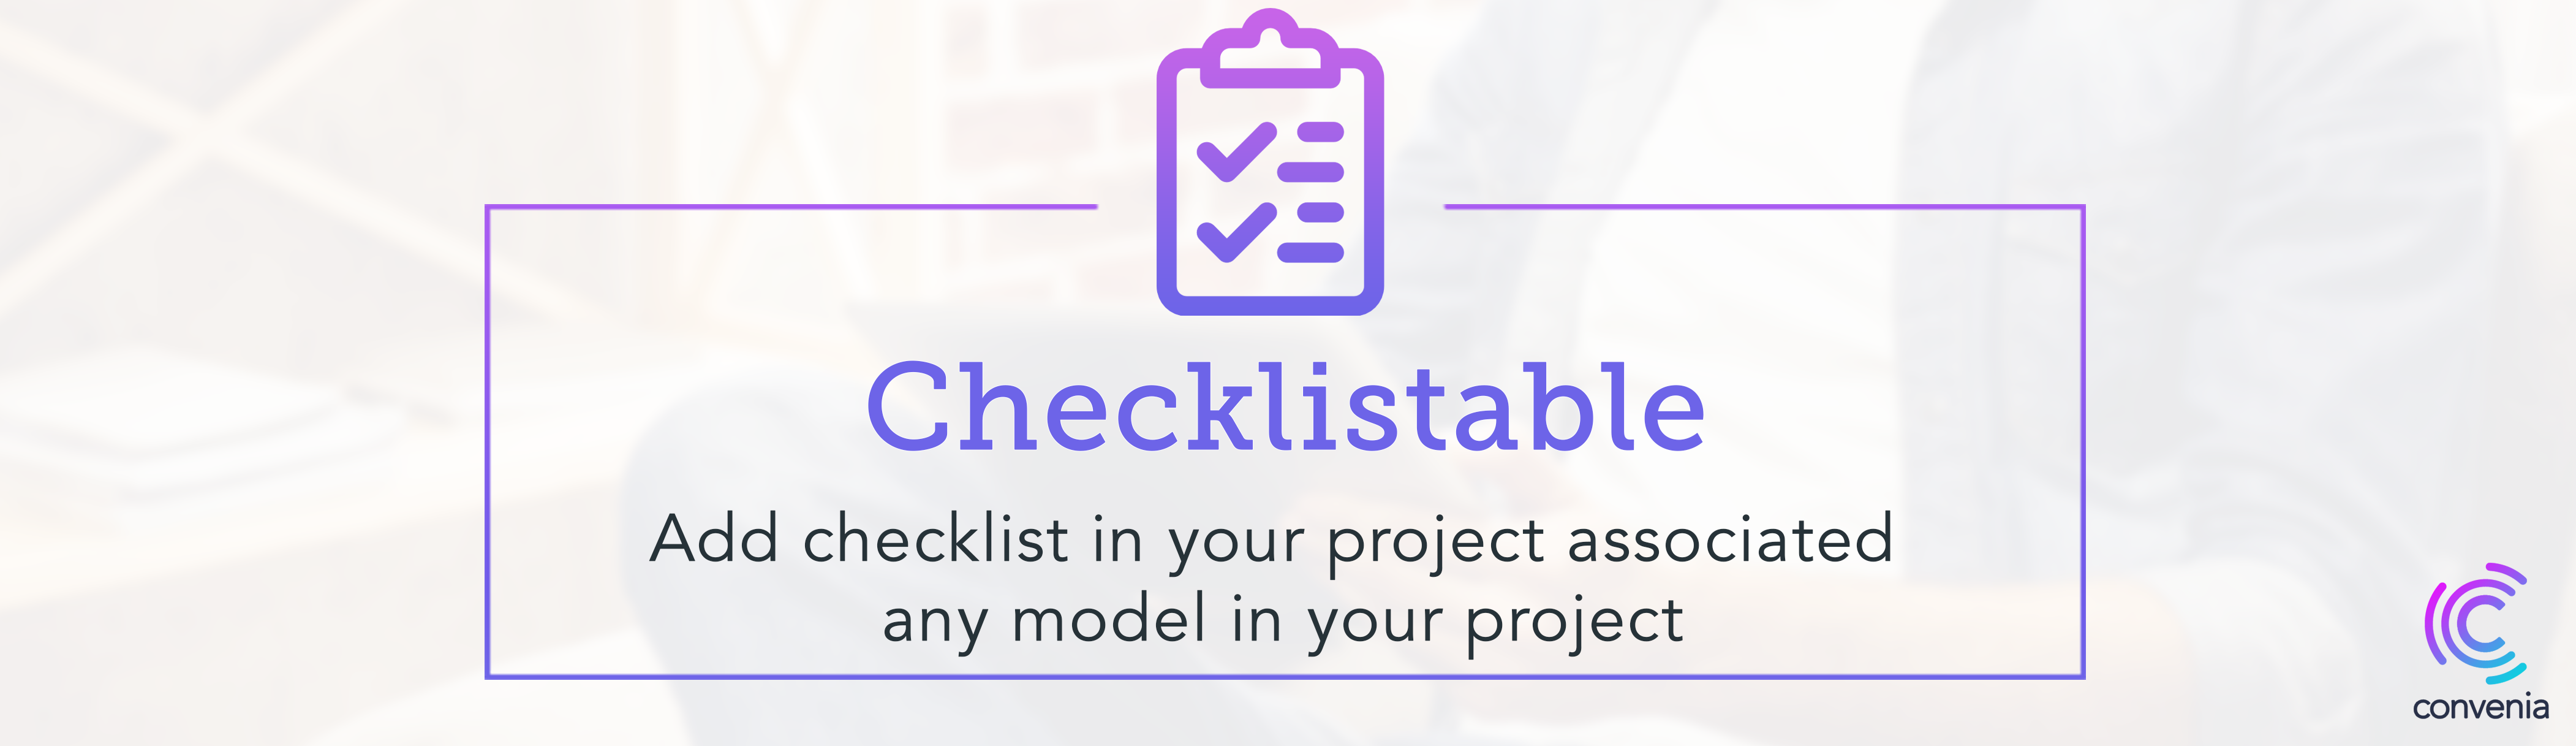 checklistable logo